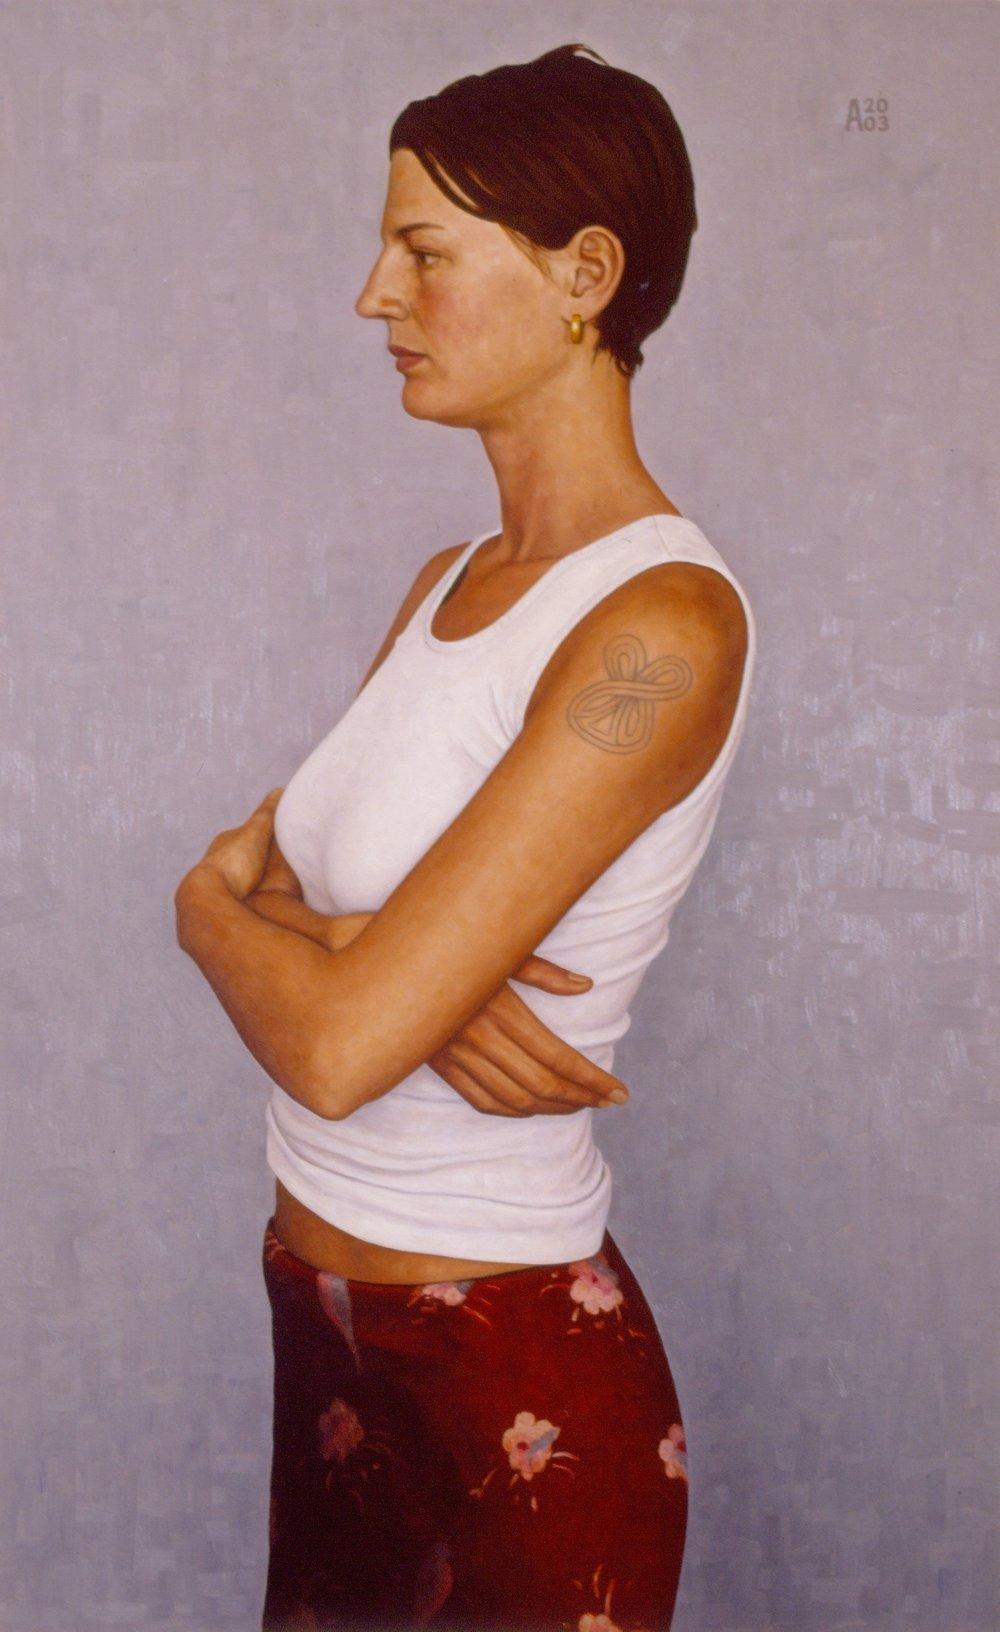 Jacqueline Stockdale